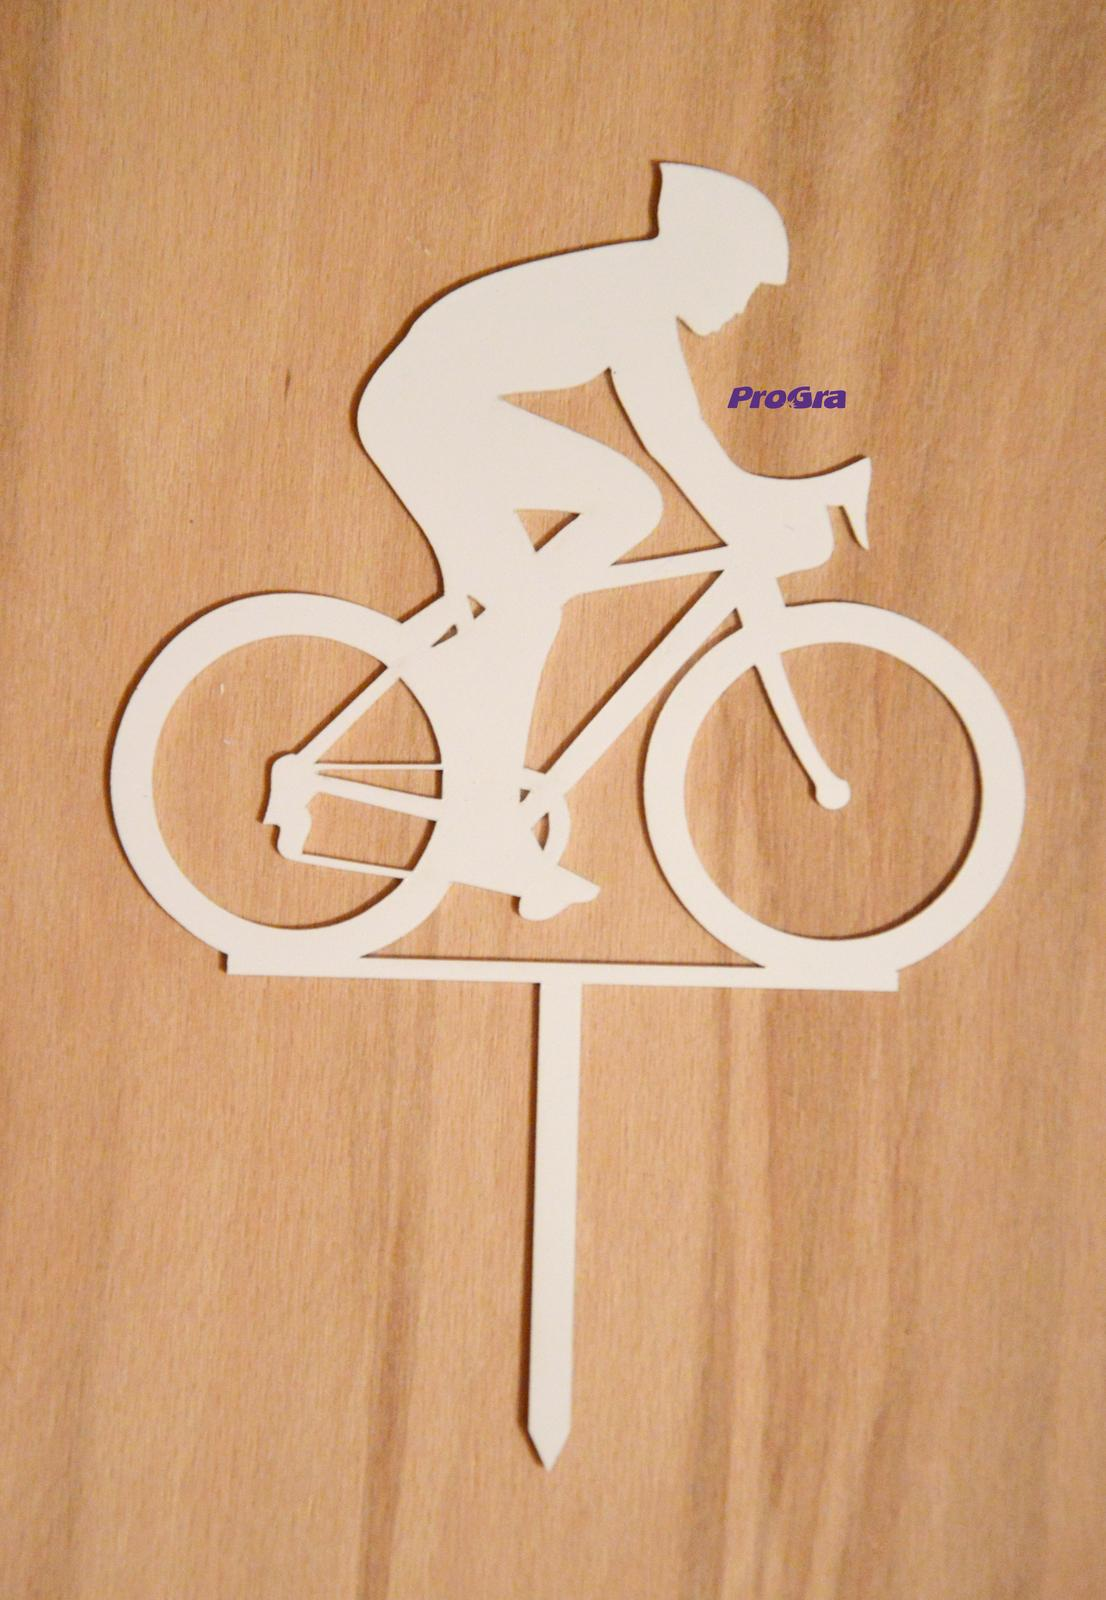 Cyklista - bílý zápich - Obrázek č. 1